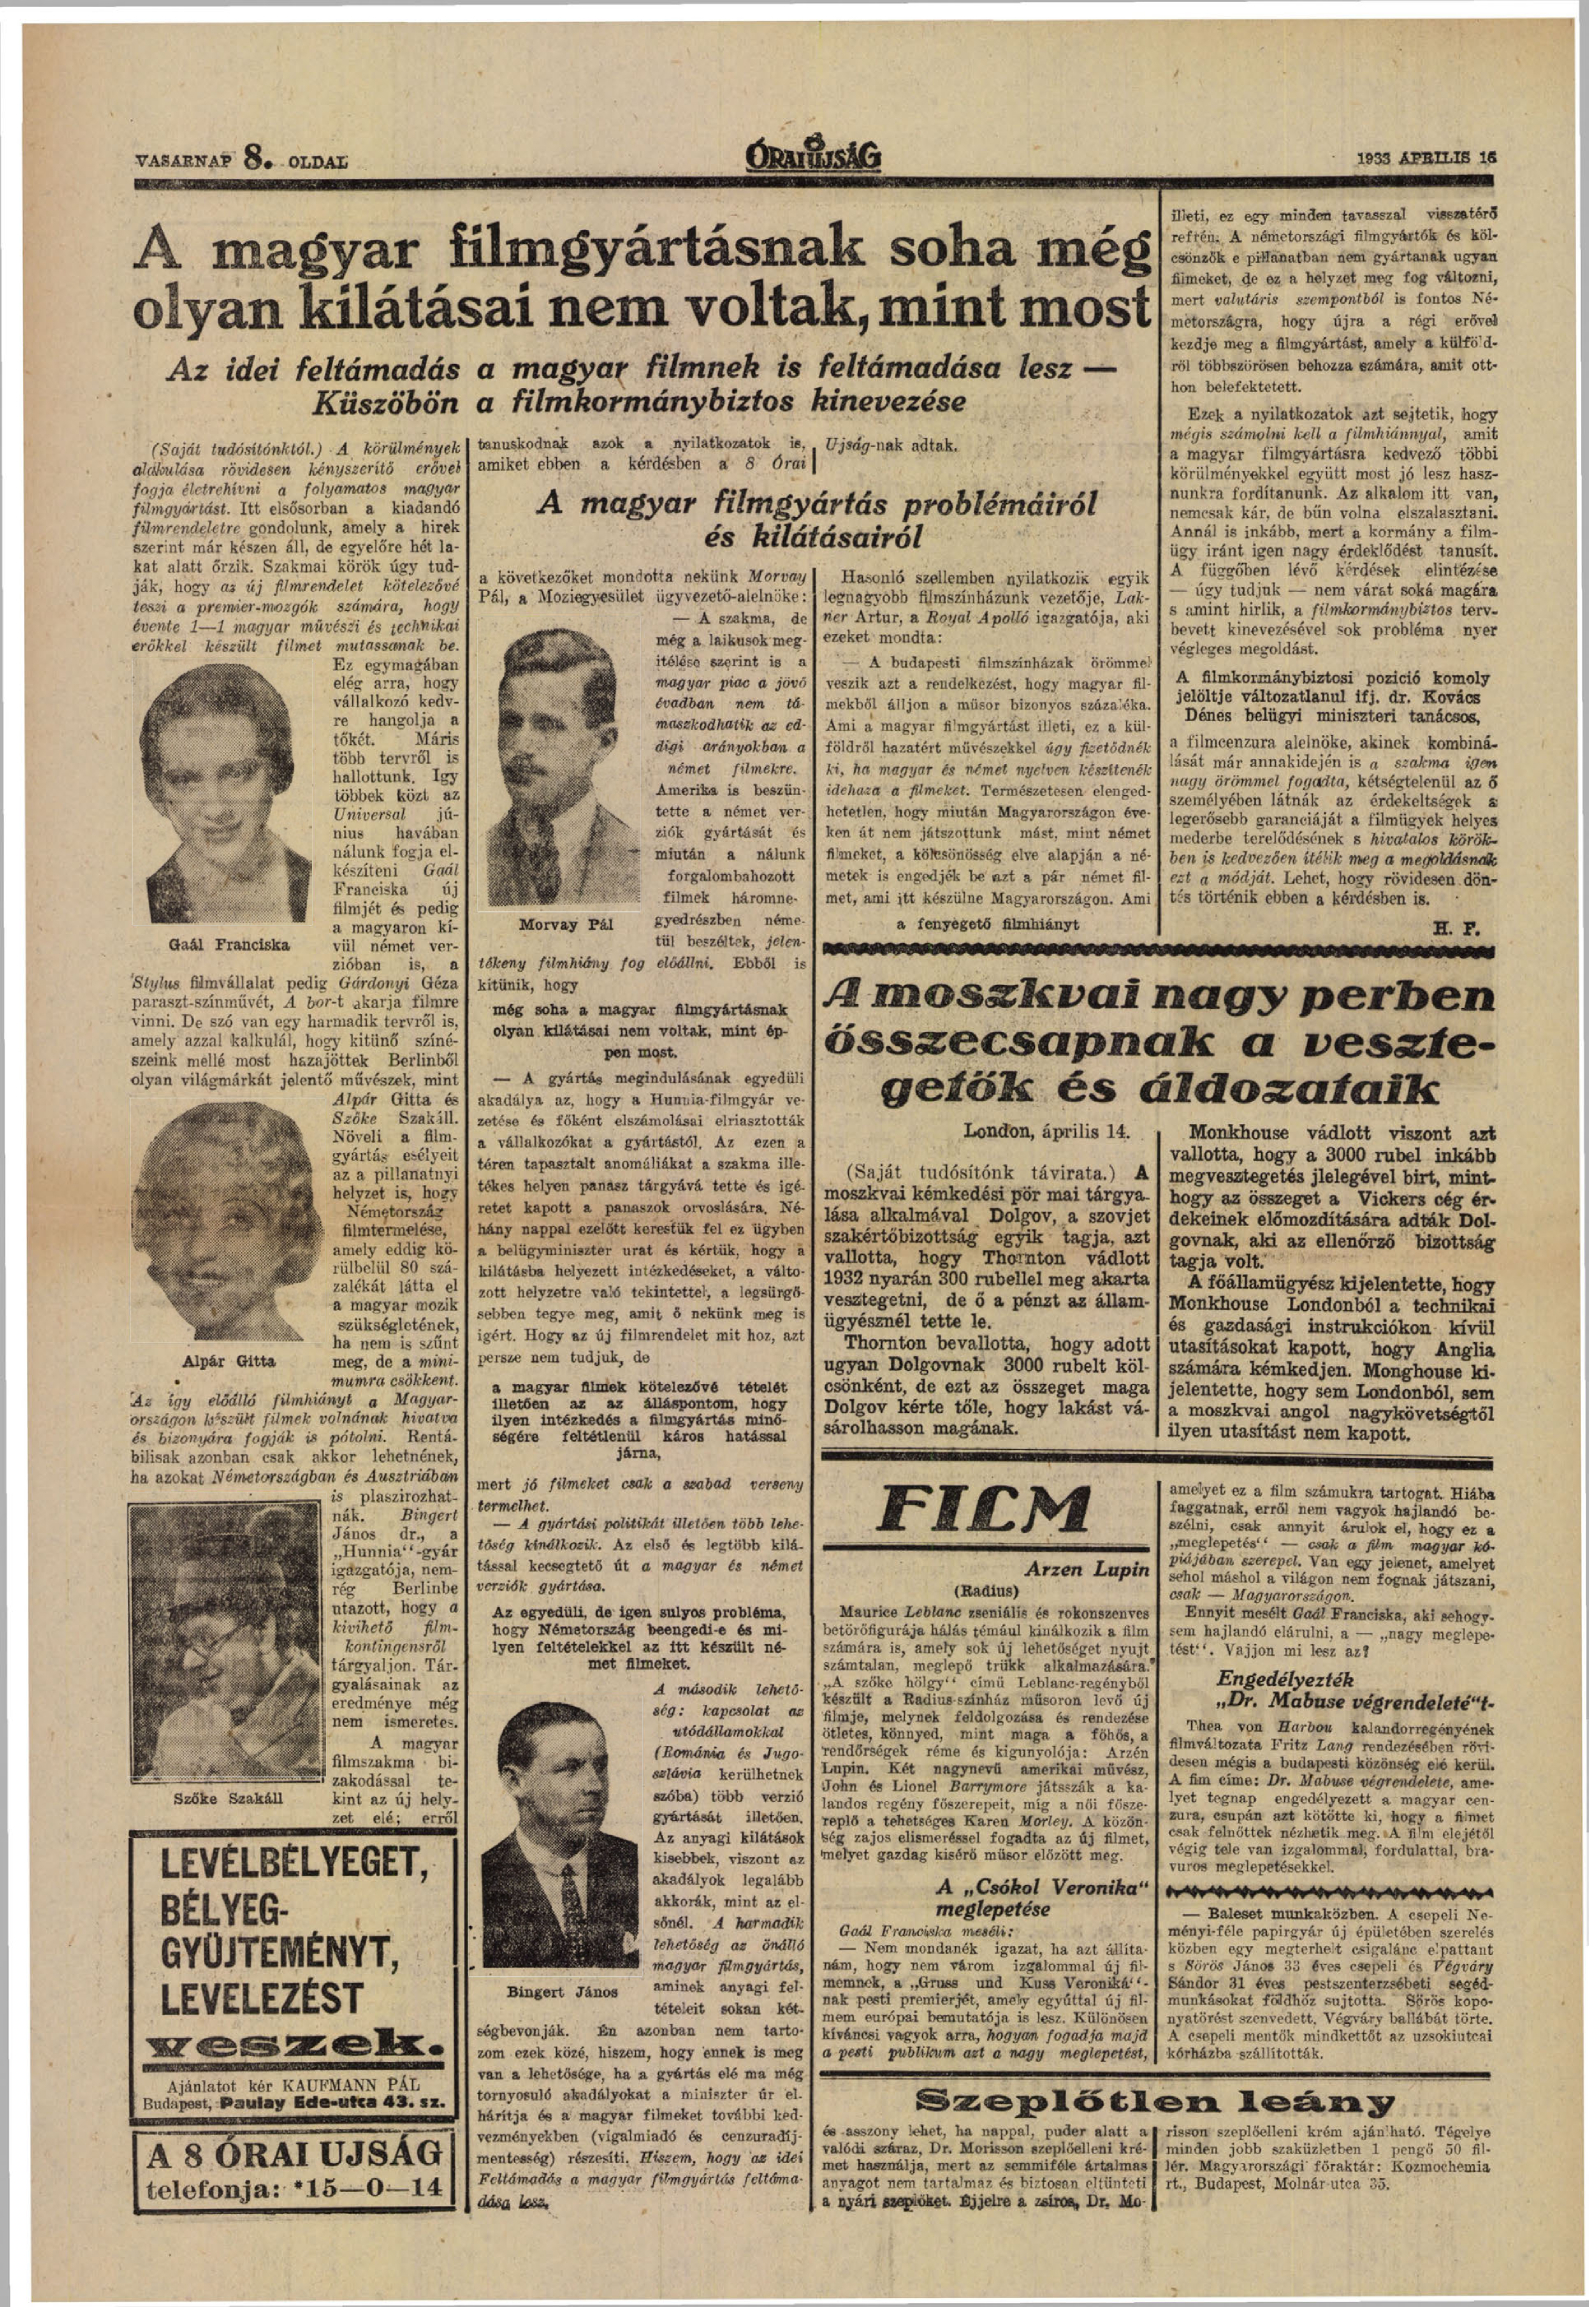 8 órai Újság, 1933